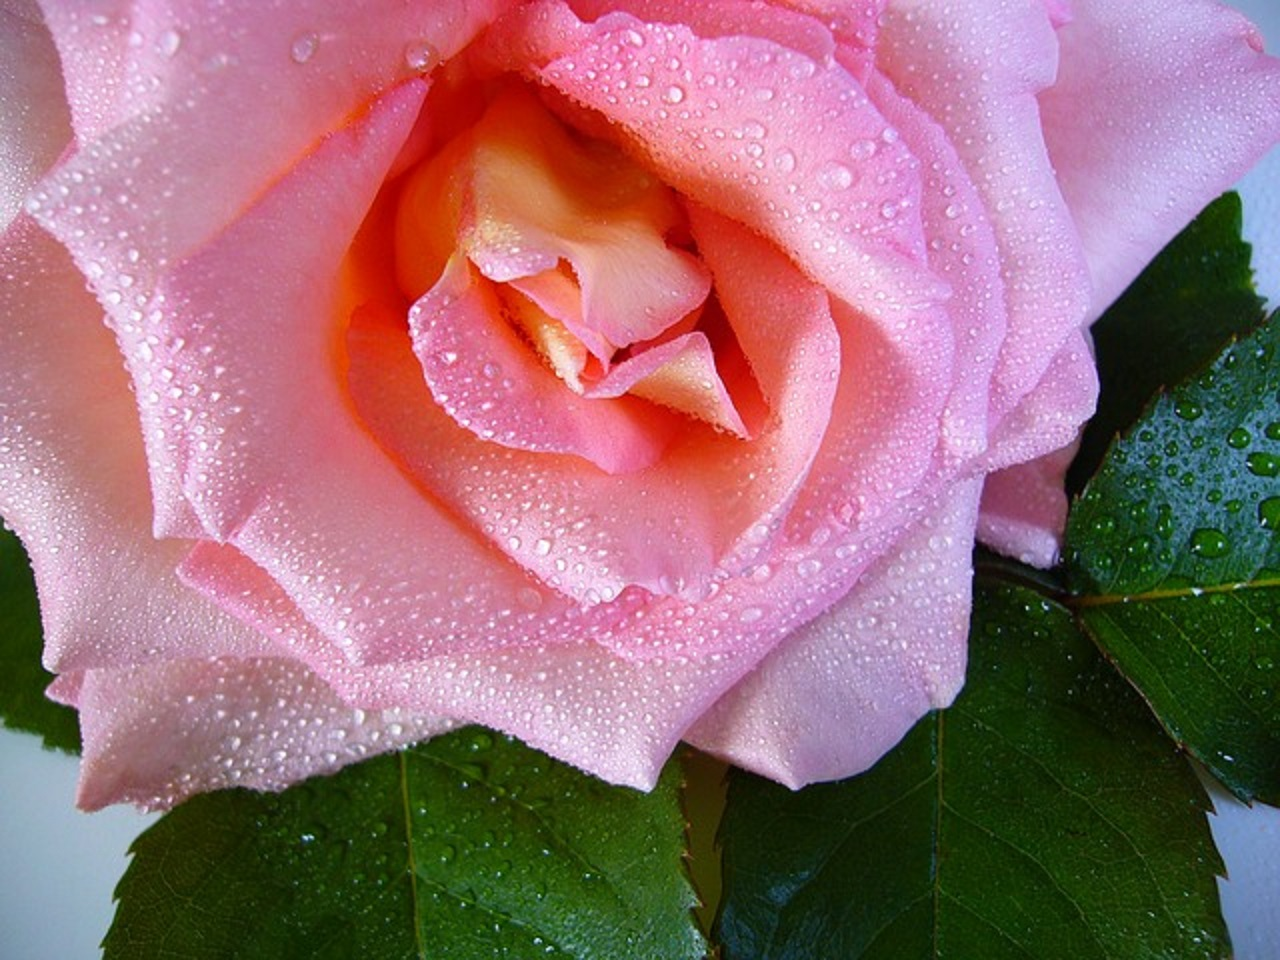 DIY Rose Water and Vegetable Glycerine Toner